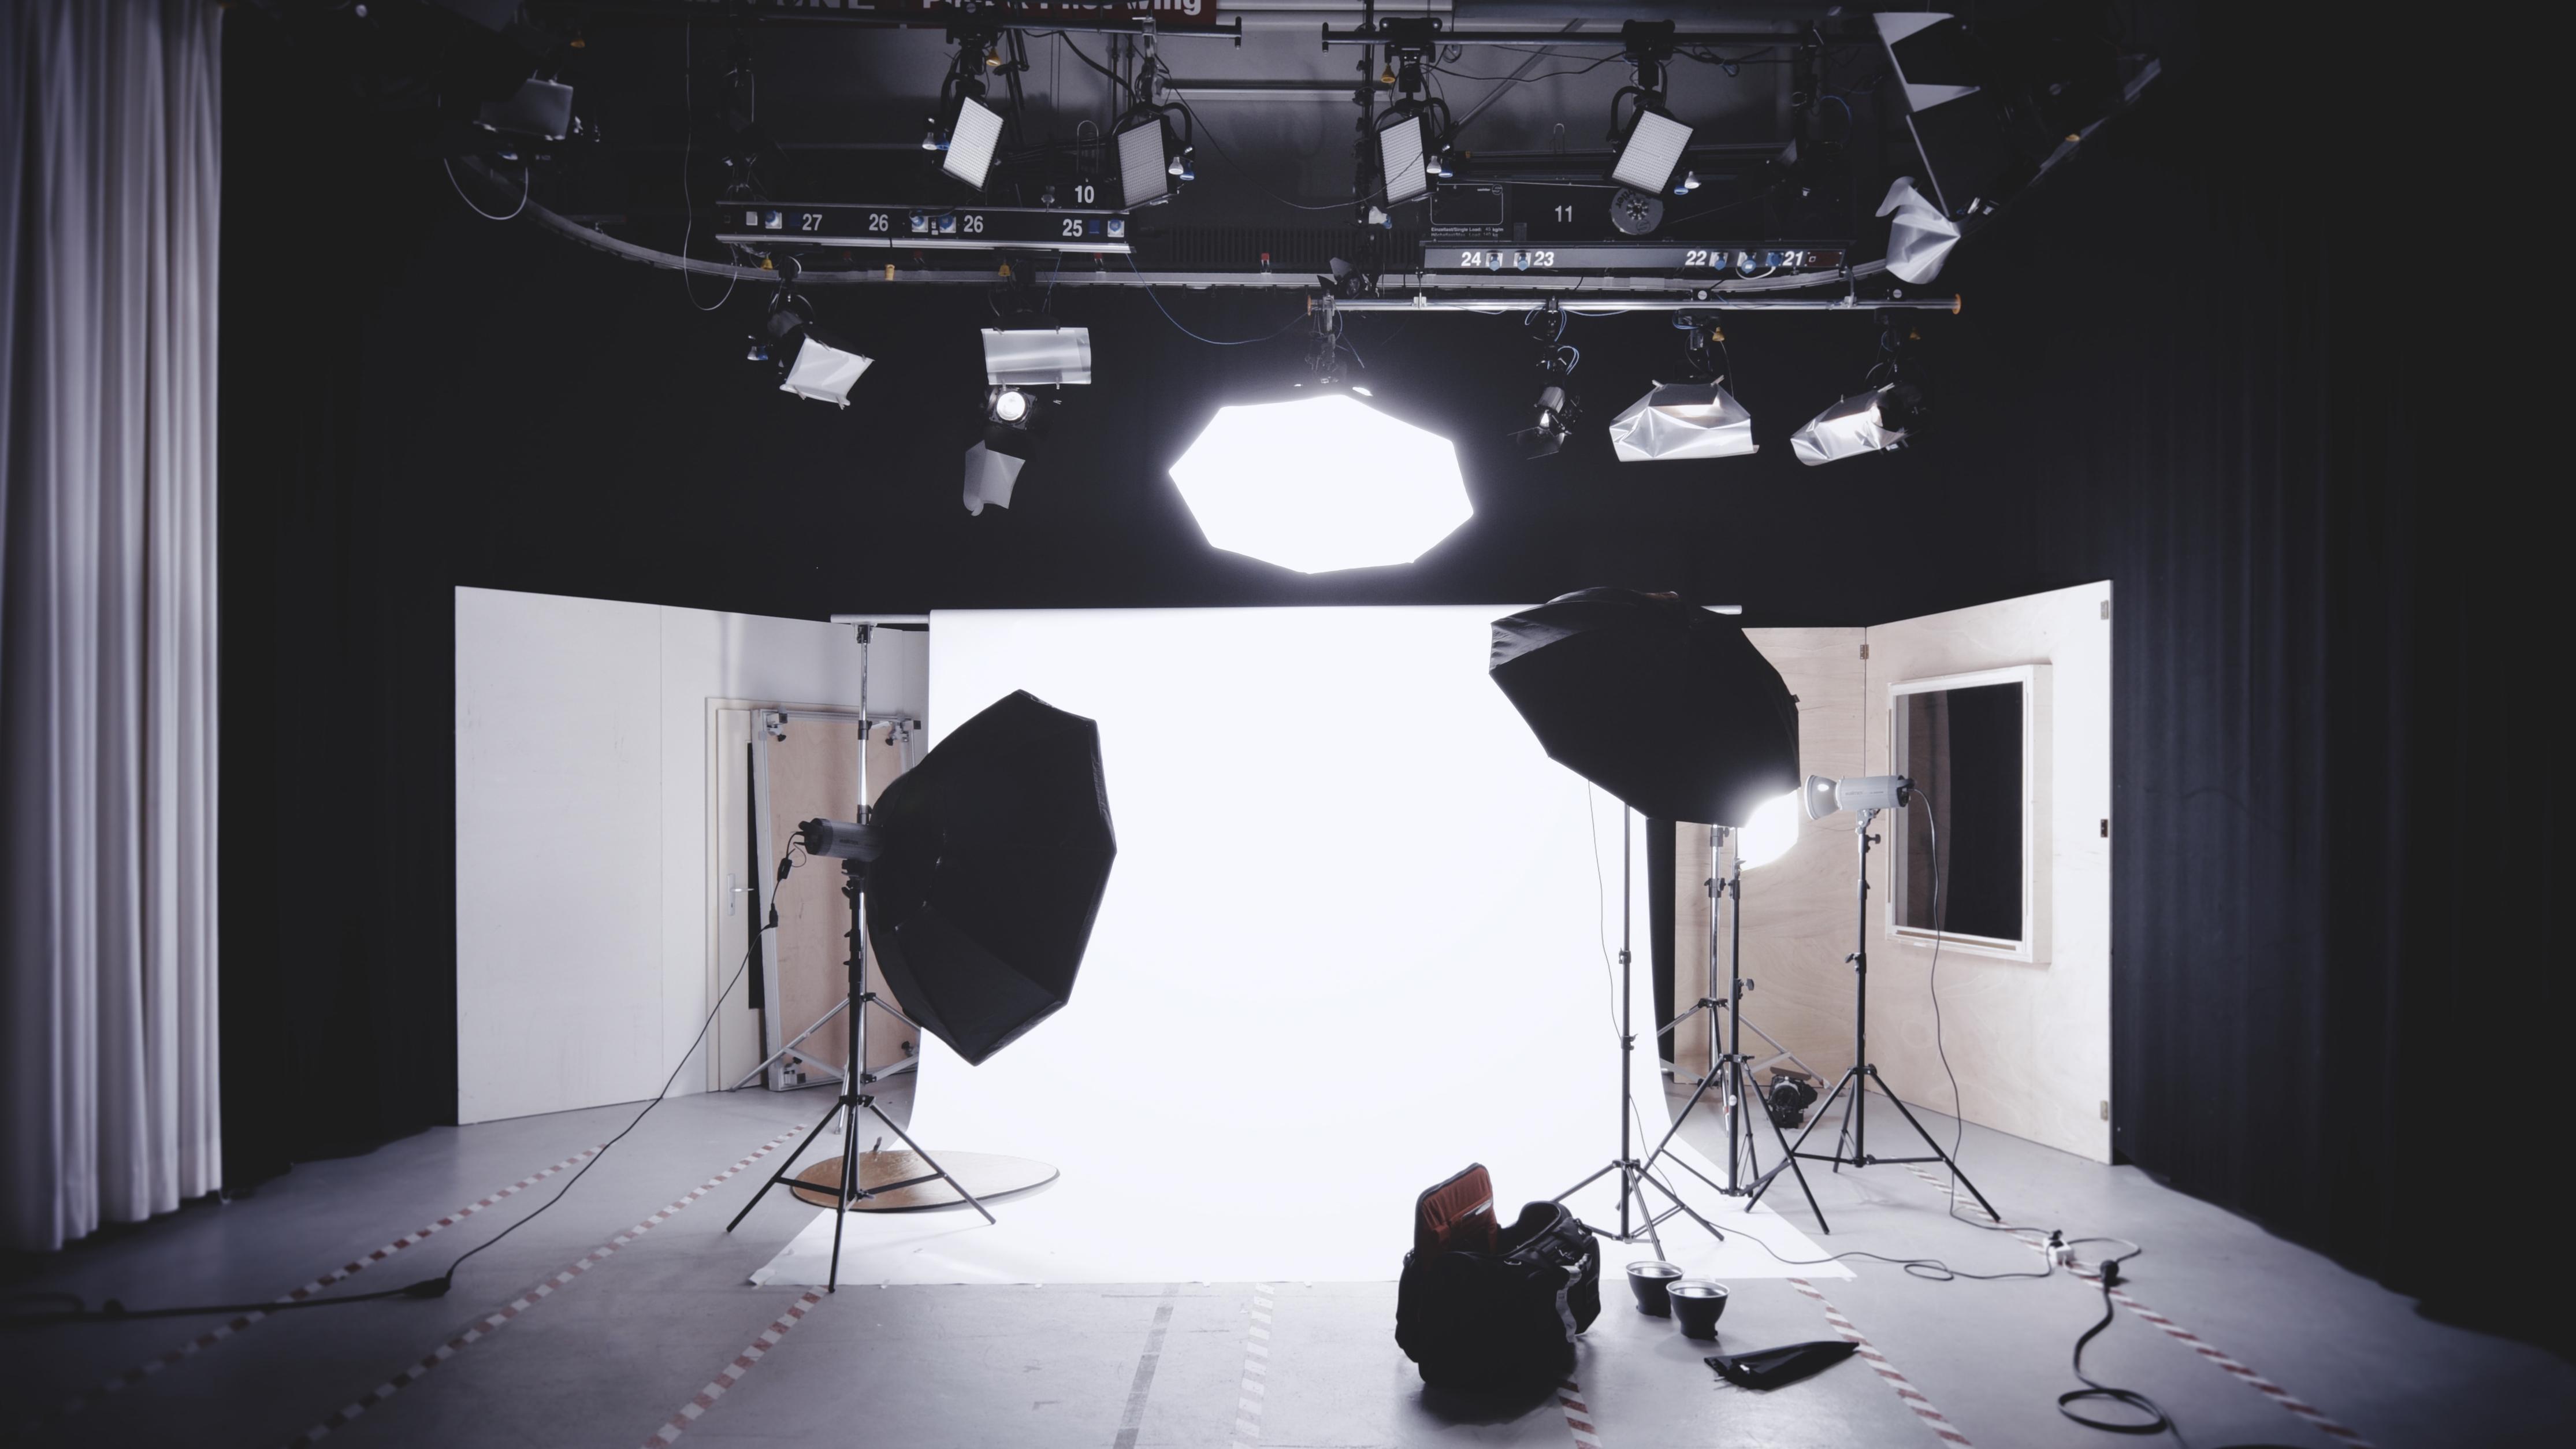 Kostenlose foto : Arbeit, Arbeiten, Technologie, Fotografie, Studio ...